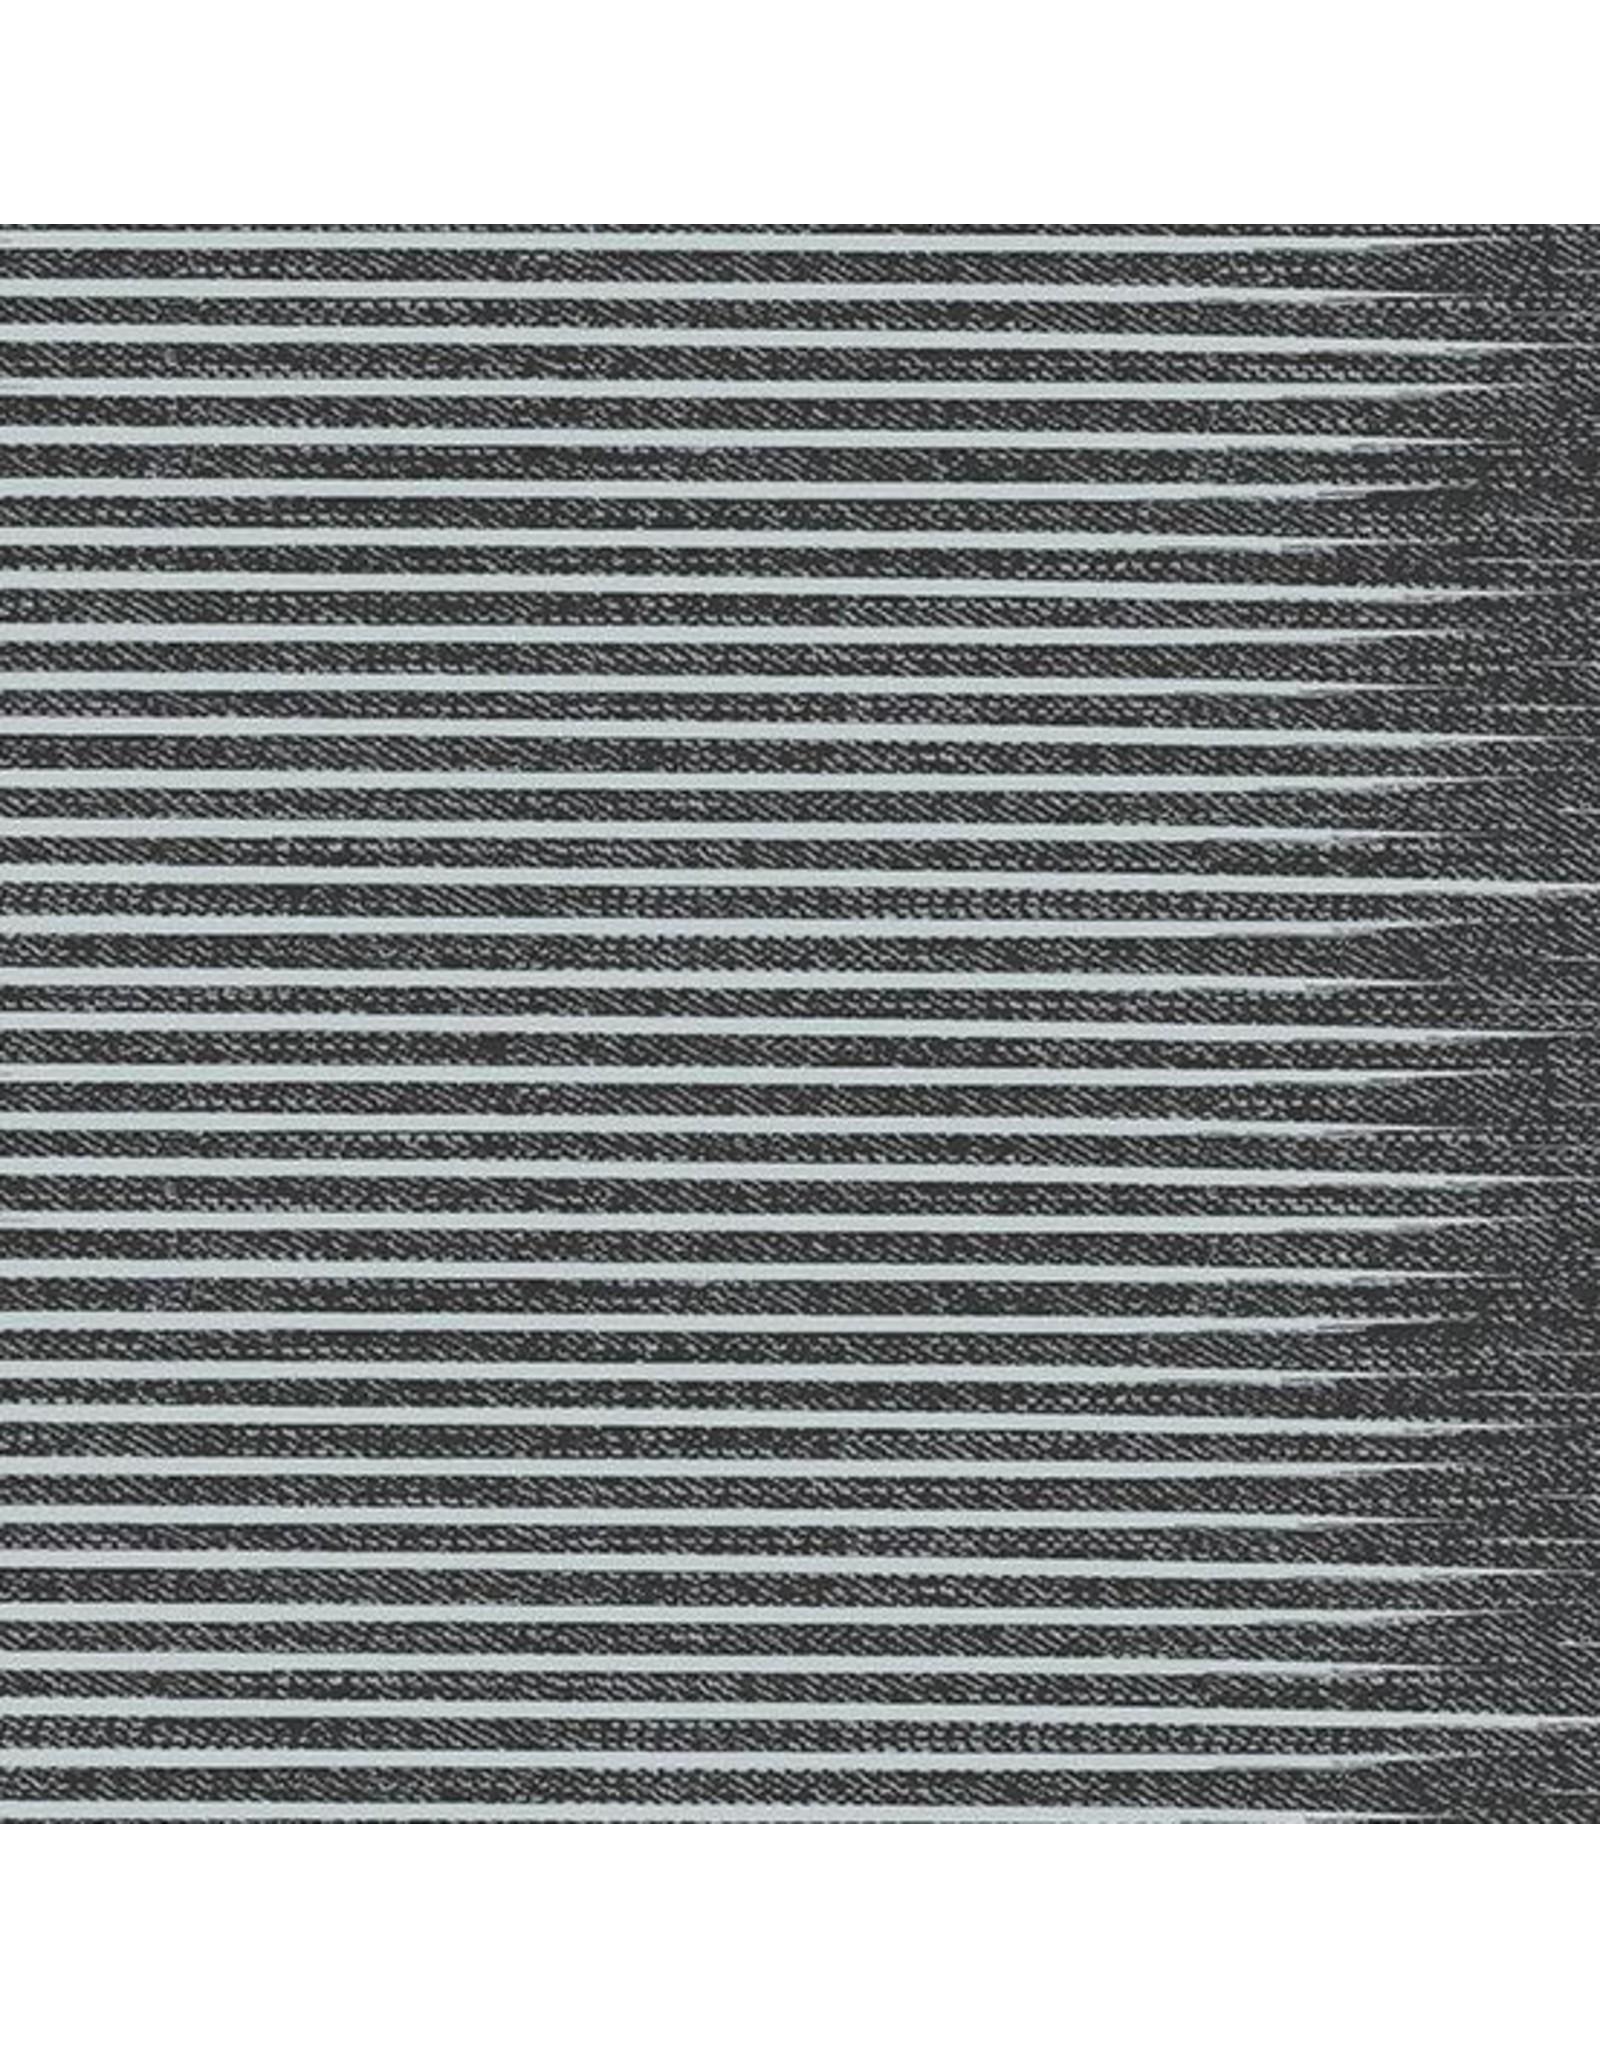 Libs Elliott ON SALE-Almost Blue, Stripe in Asphalt, Fabric FULL-Yards